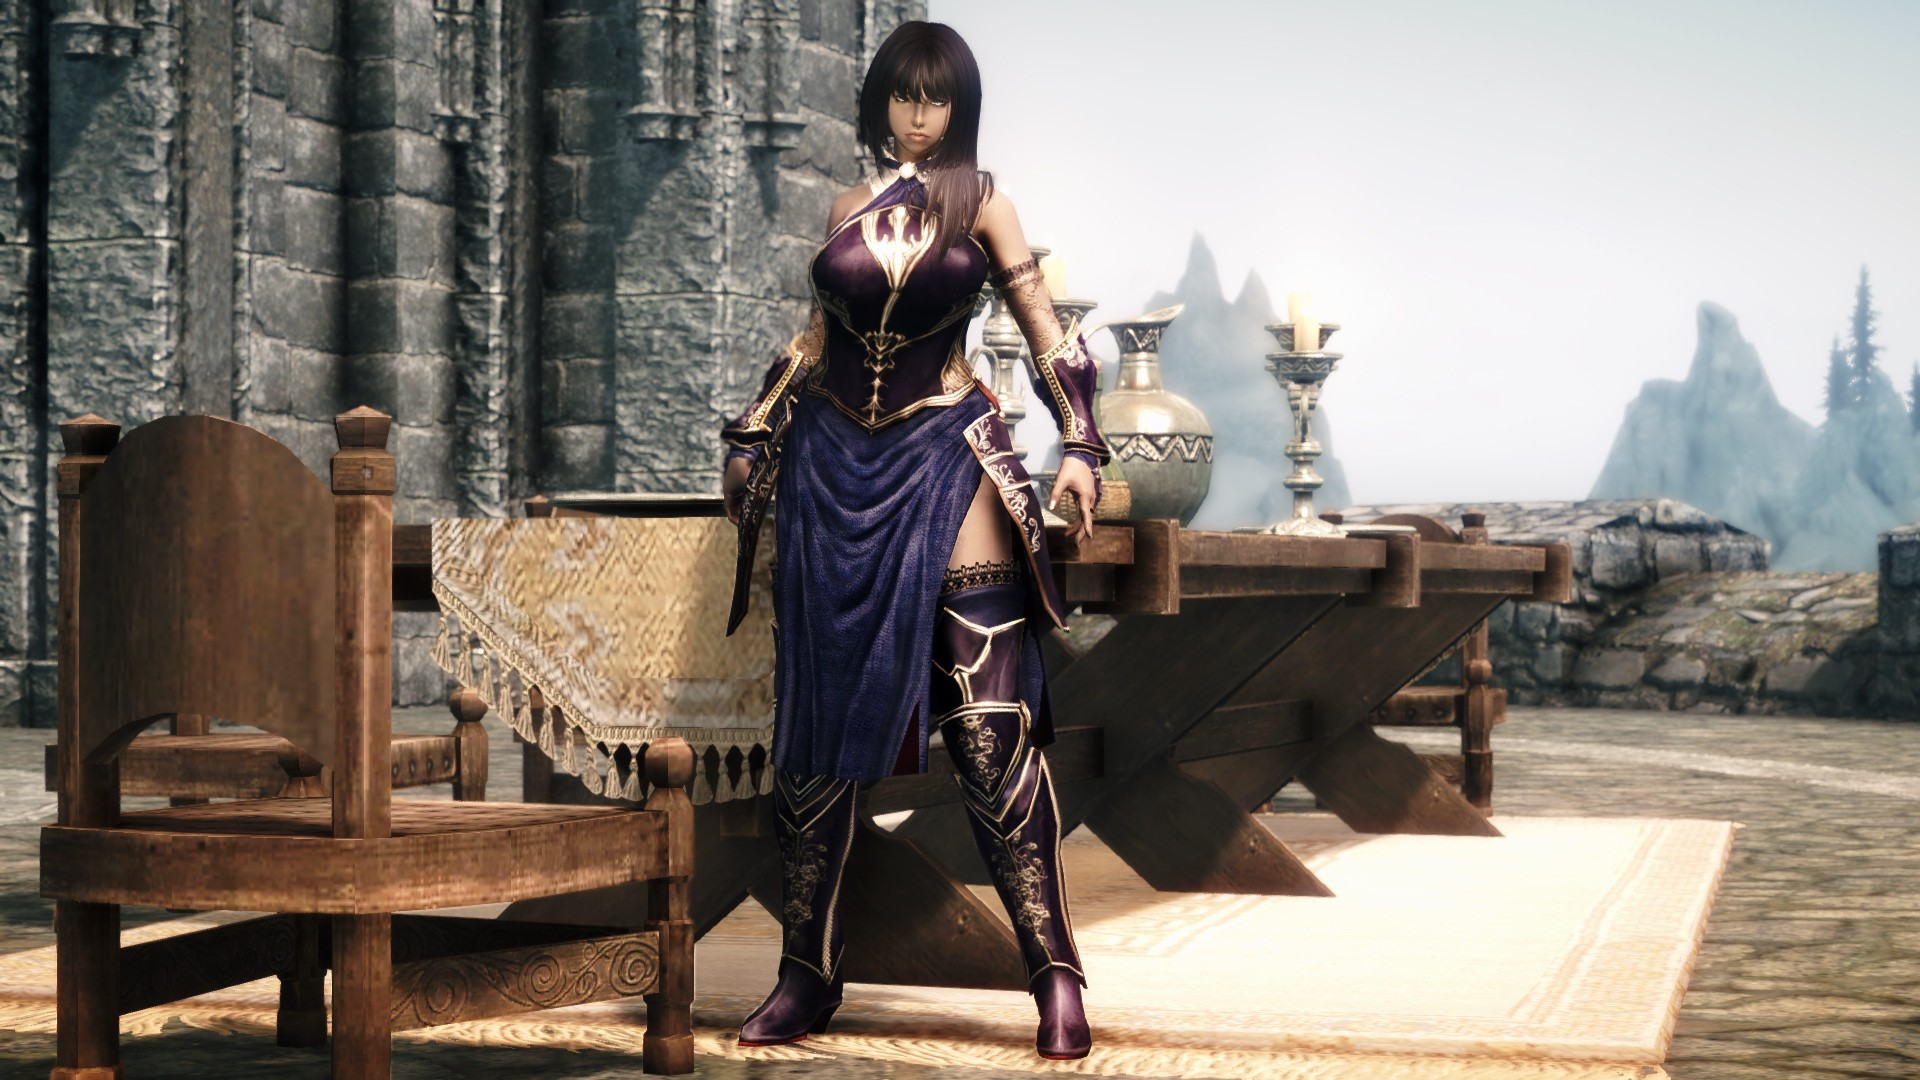 General 1920x1080 video games Shanoa (Castlevania) Castlevania Castlevania: Order Of Ecclesia